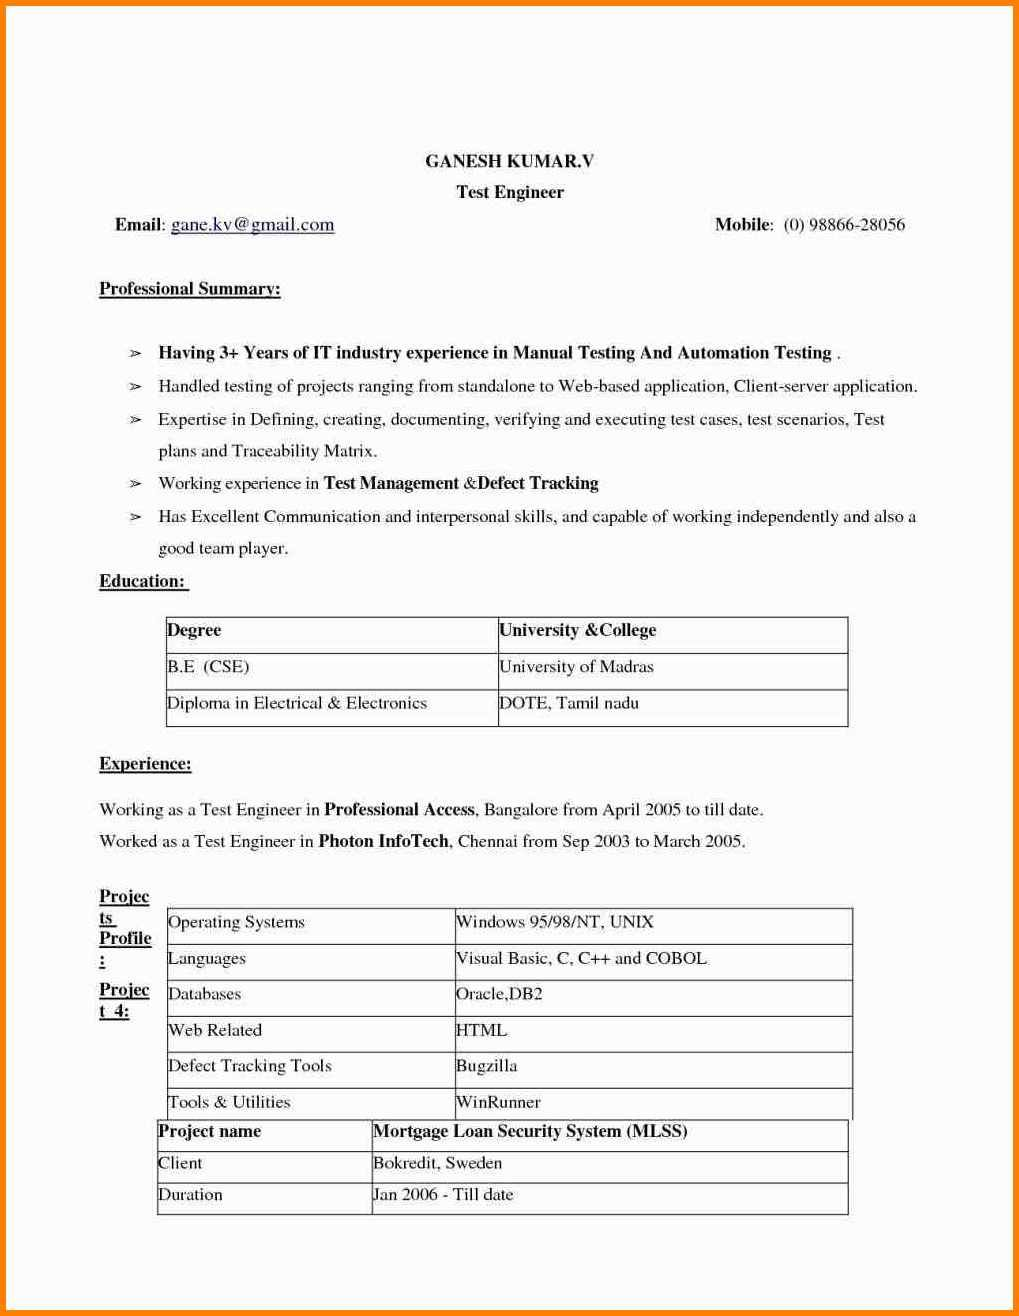 biodata model download biodata format download for